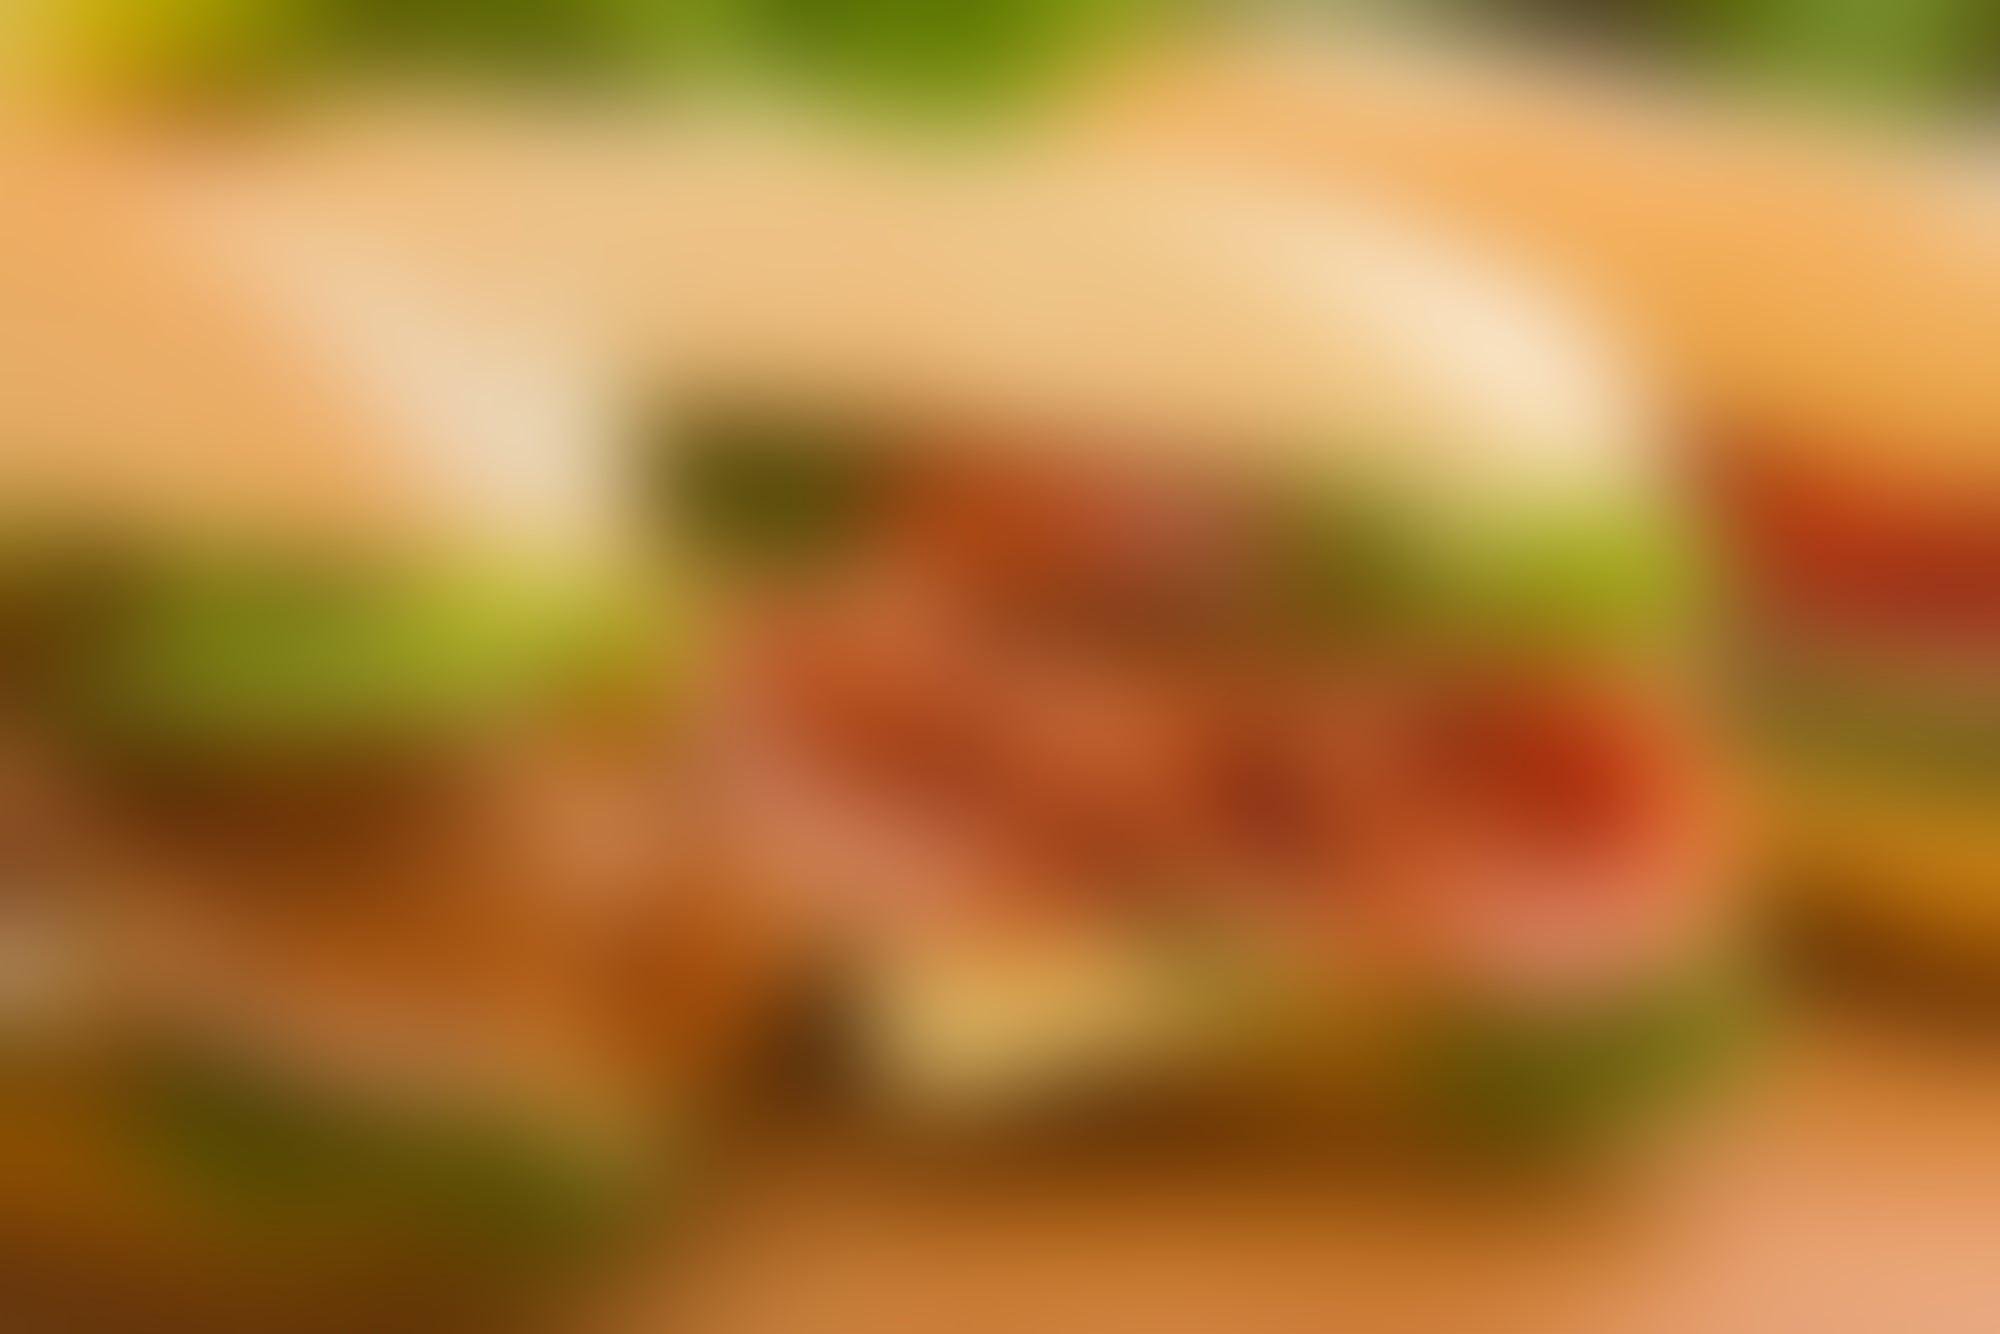 The Top 10 Sandwich Franchises of 2012